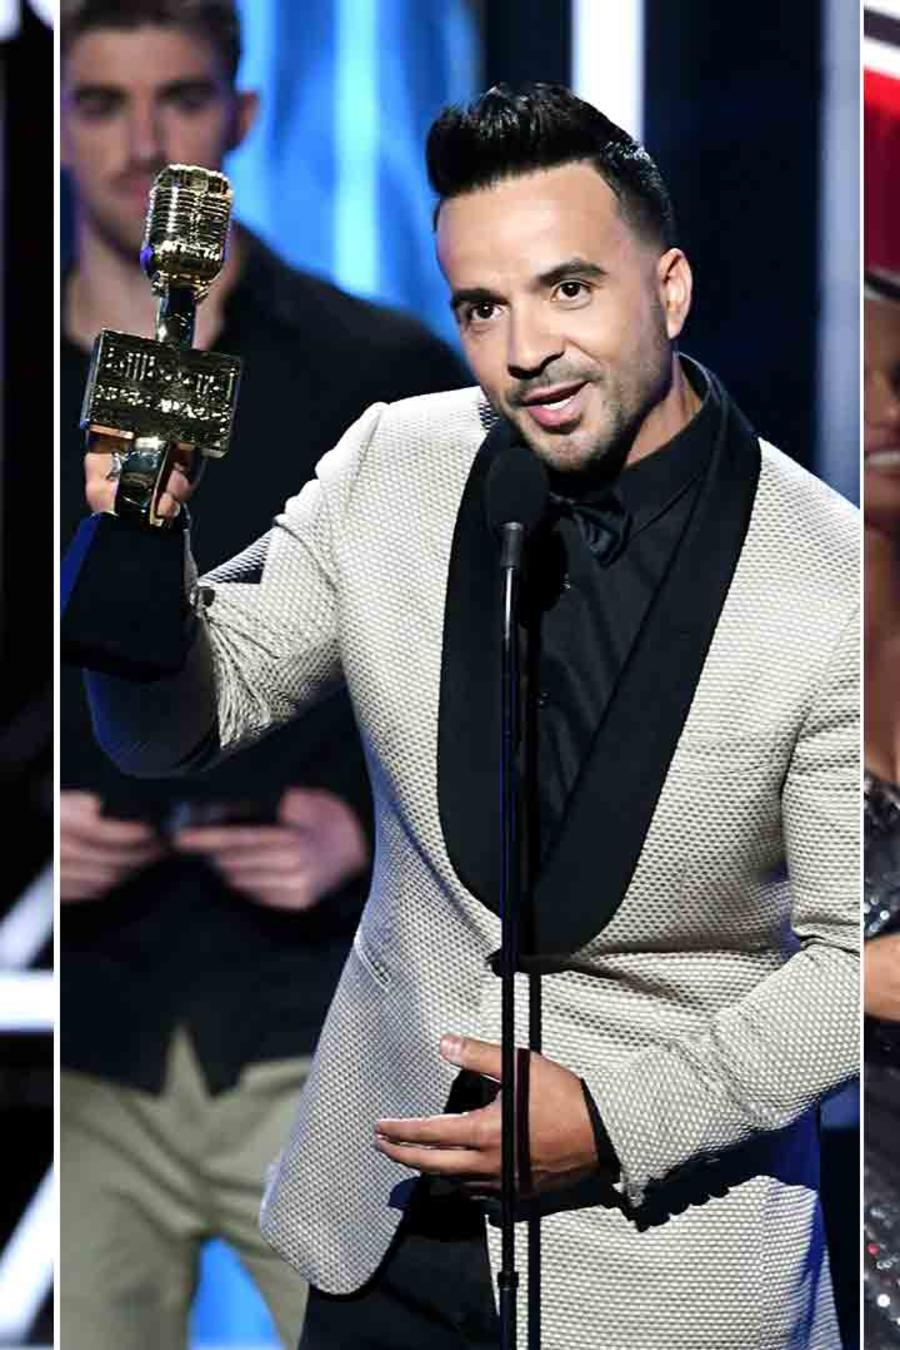 Taylor Swift, Luis Fonsi, Camila Cabello at the Billboard Music Awards 2018